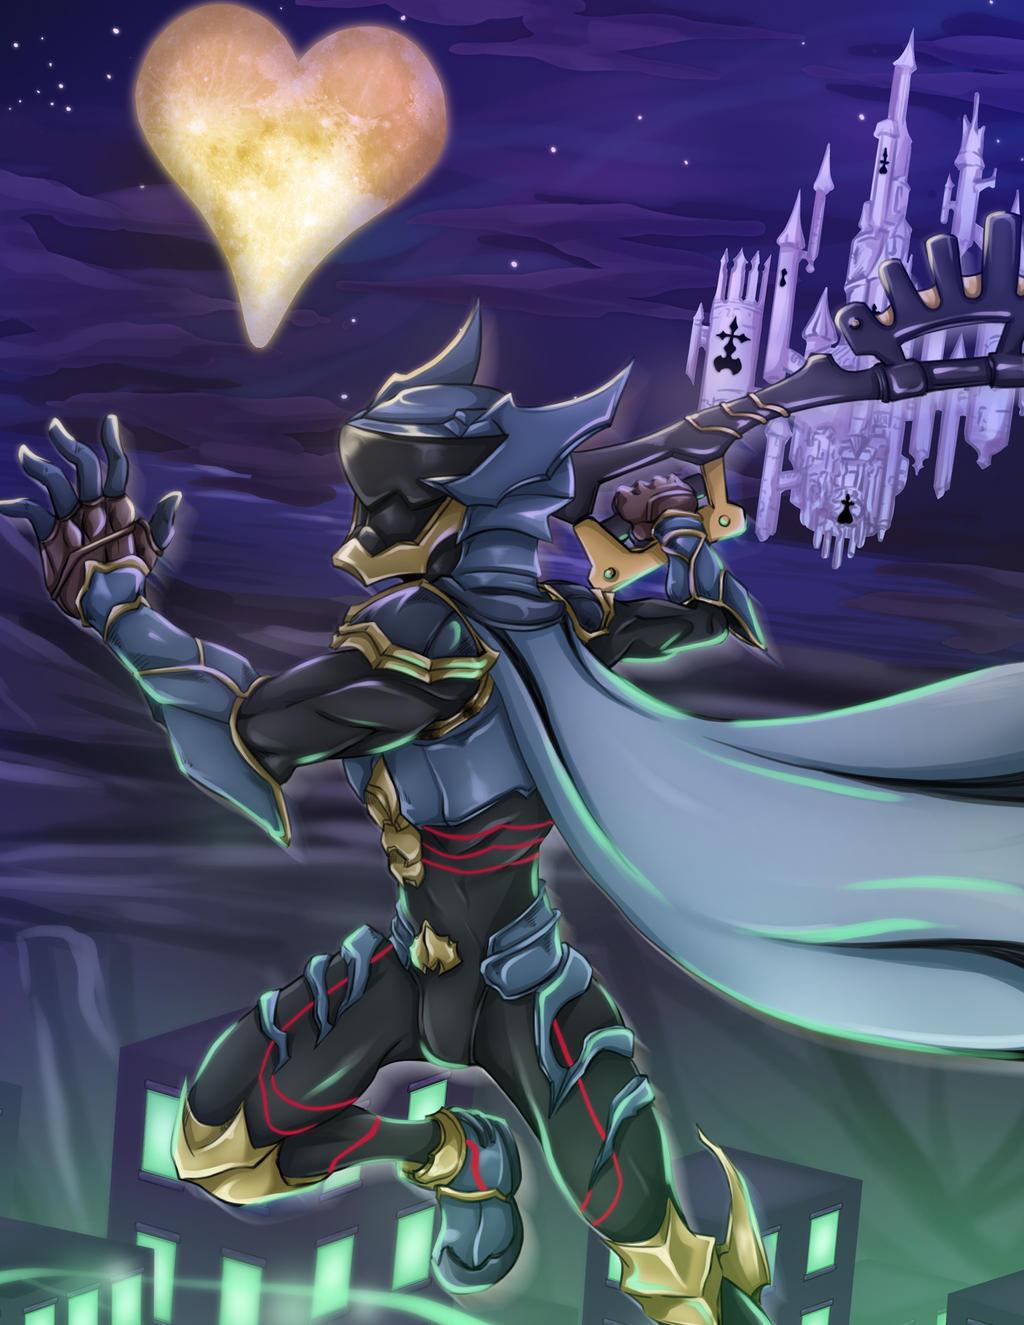 Ventus Keyblade armor by KajiMateria on DeviantArt